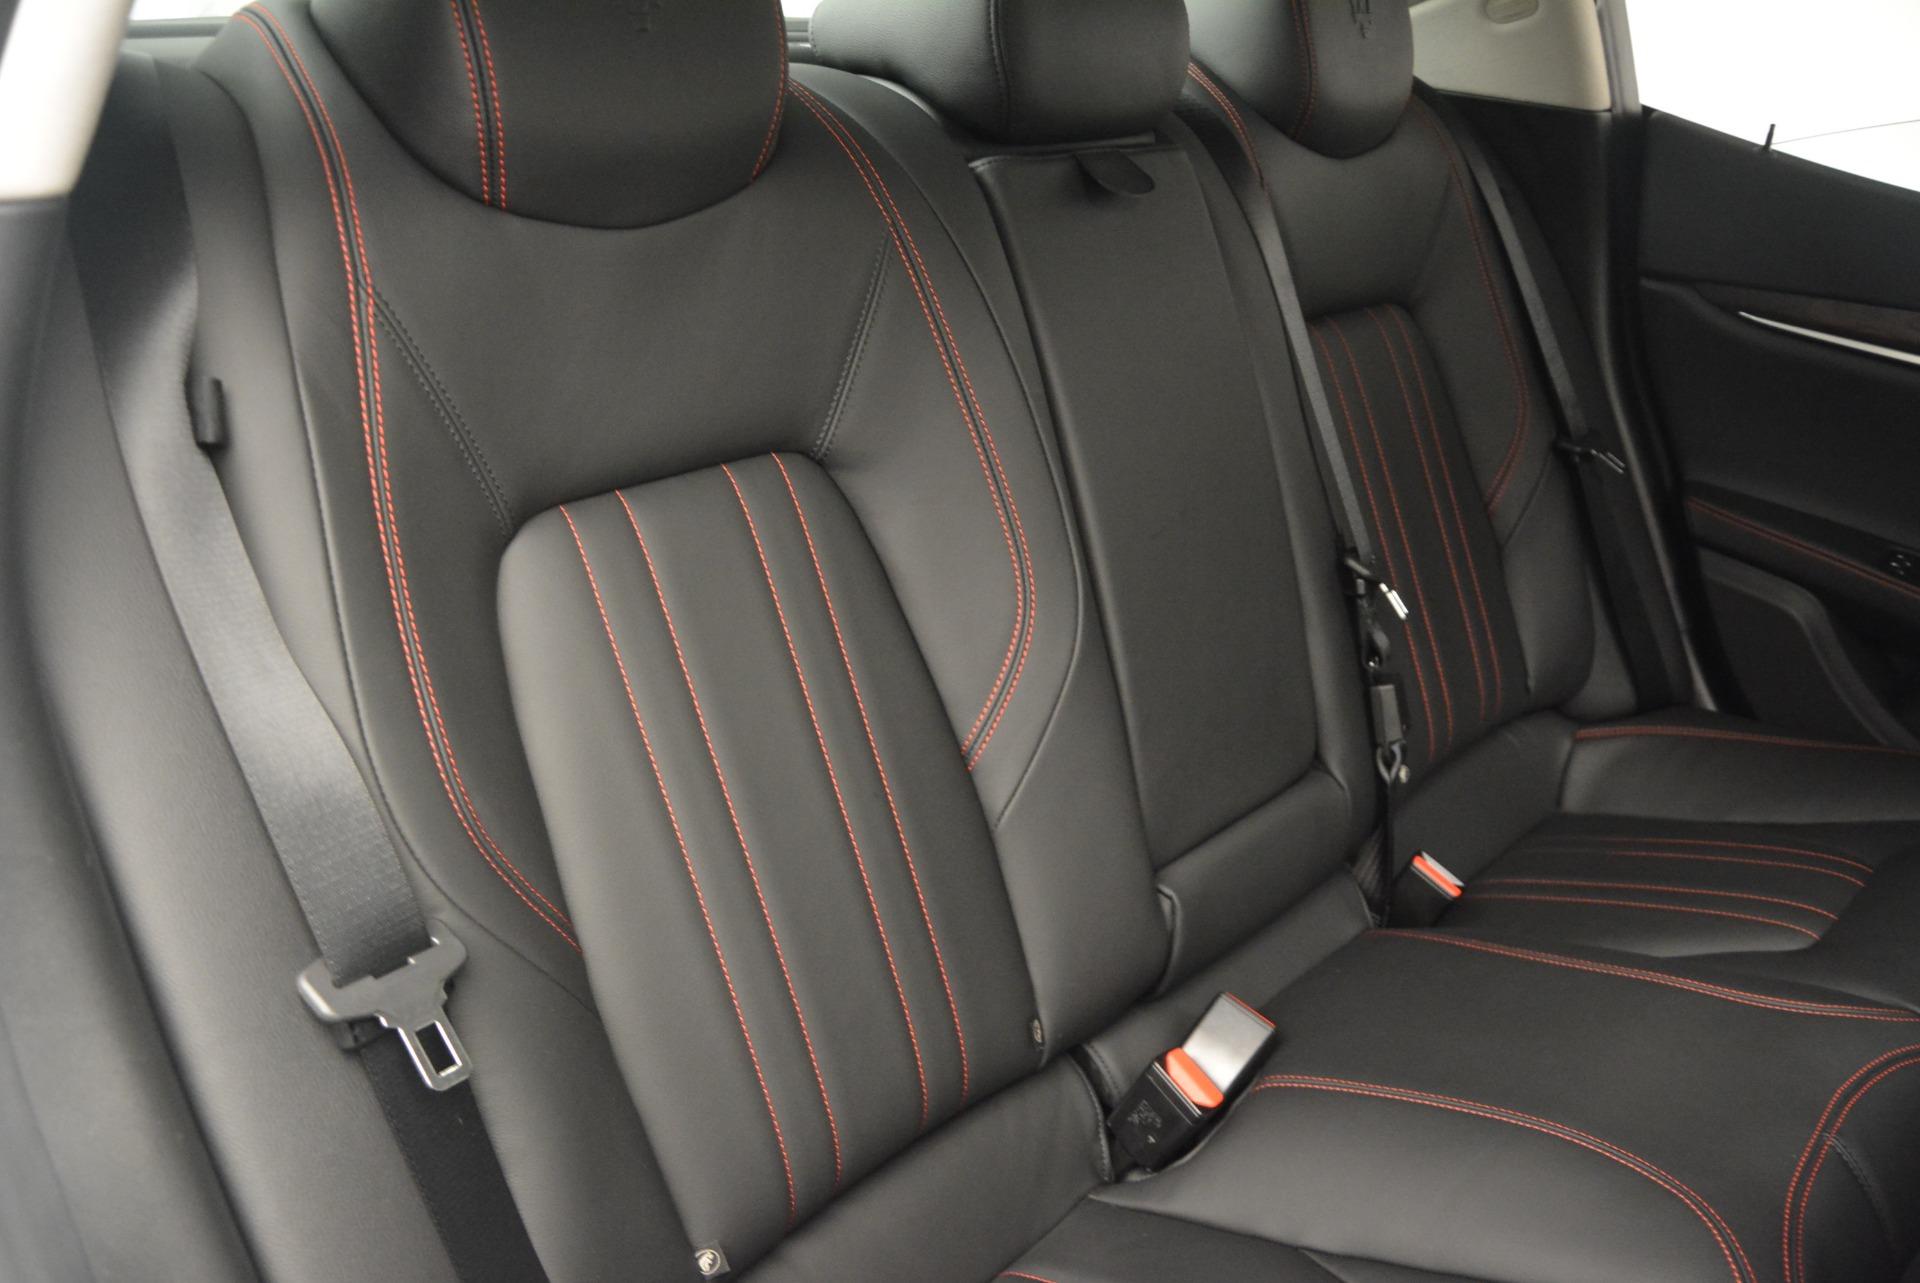 Used 2015 Maserati Ghibli S Q4 For Sale In Westport, CT 2070_p22